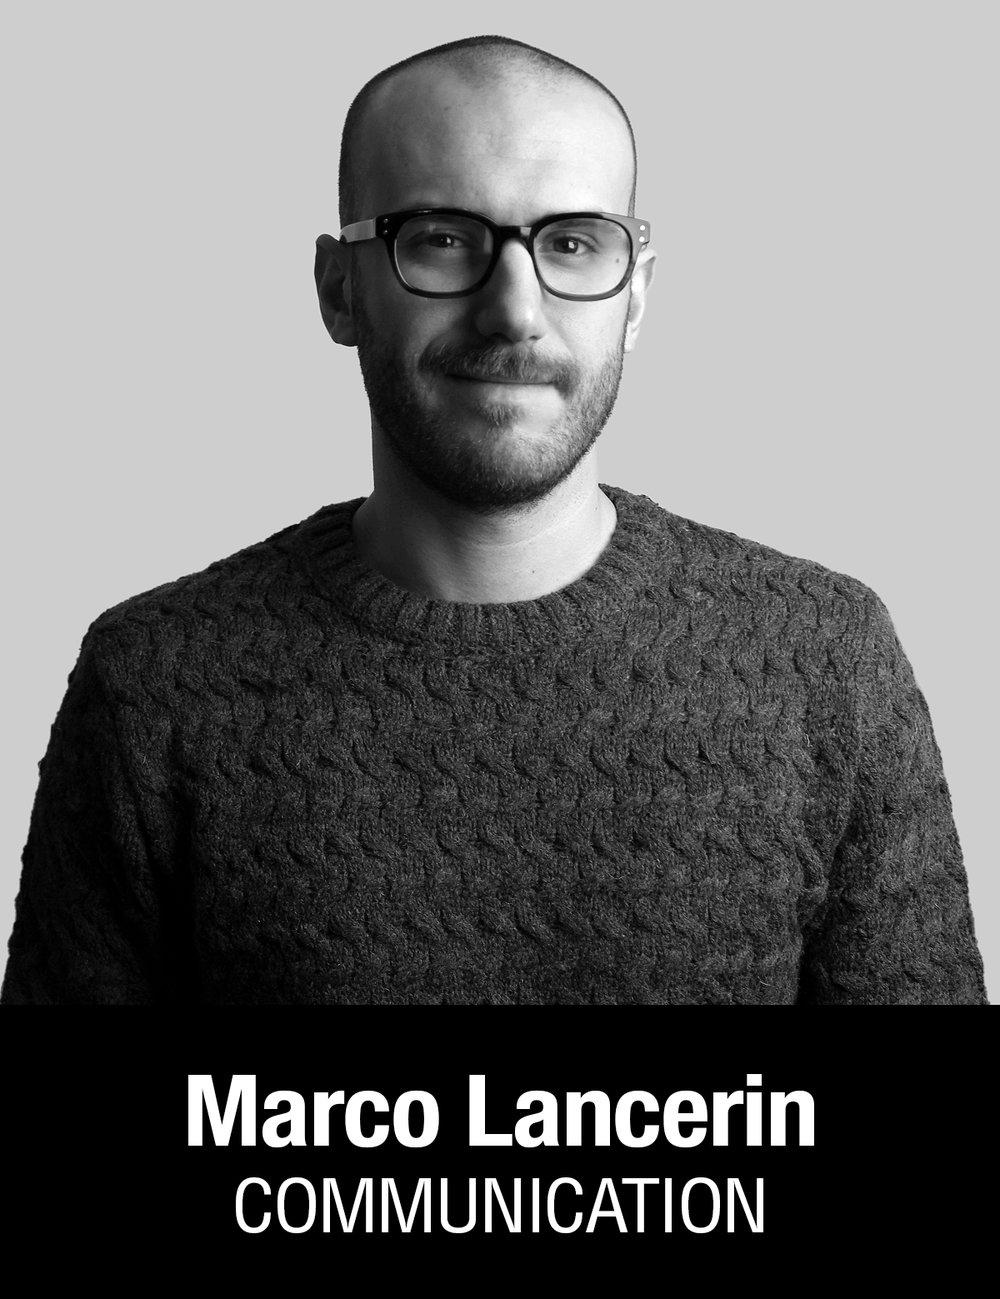 MARCO_LANCERIN.jpg